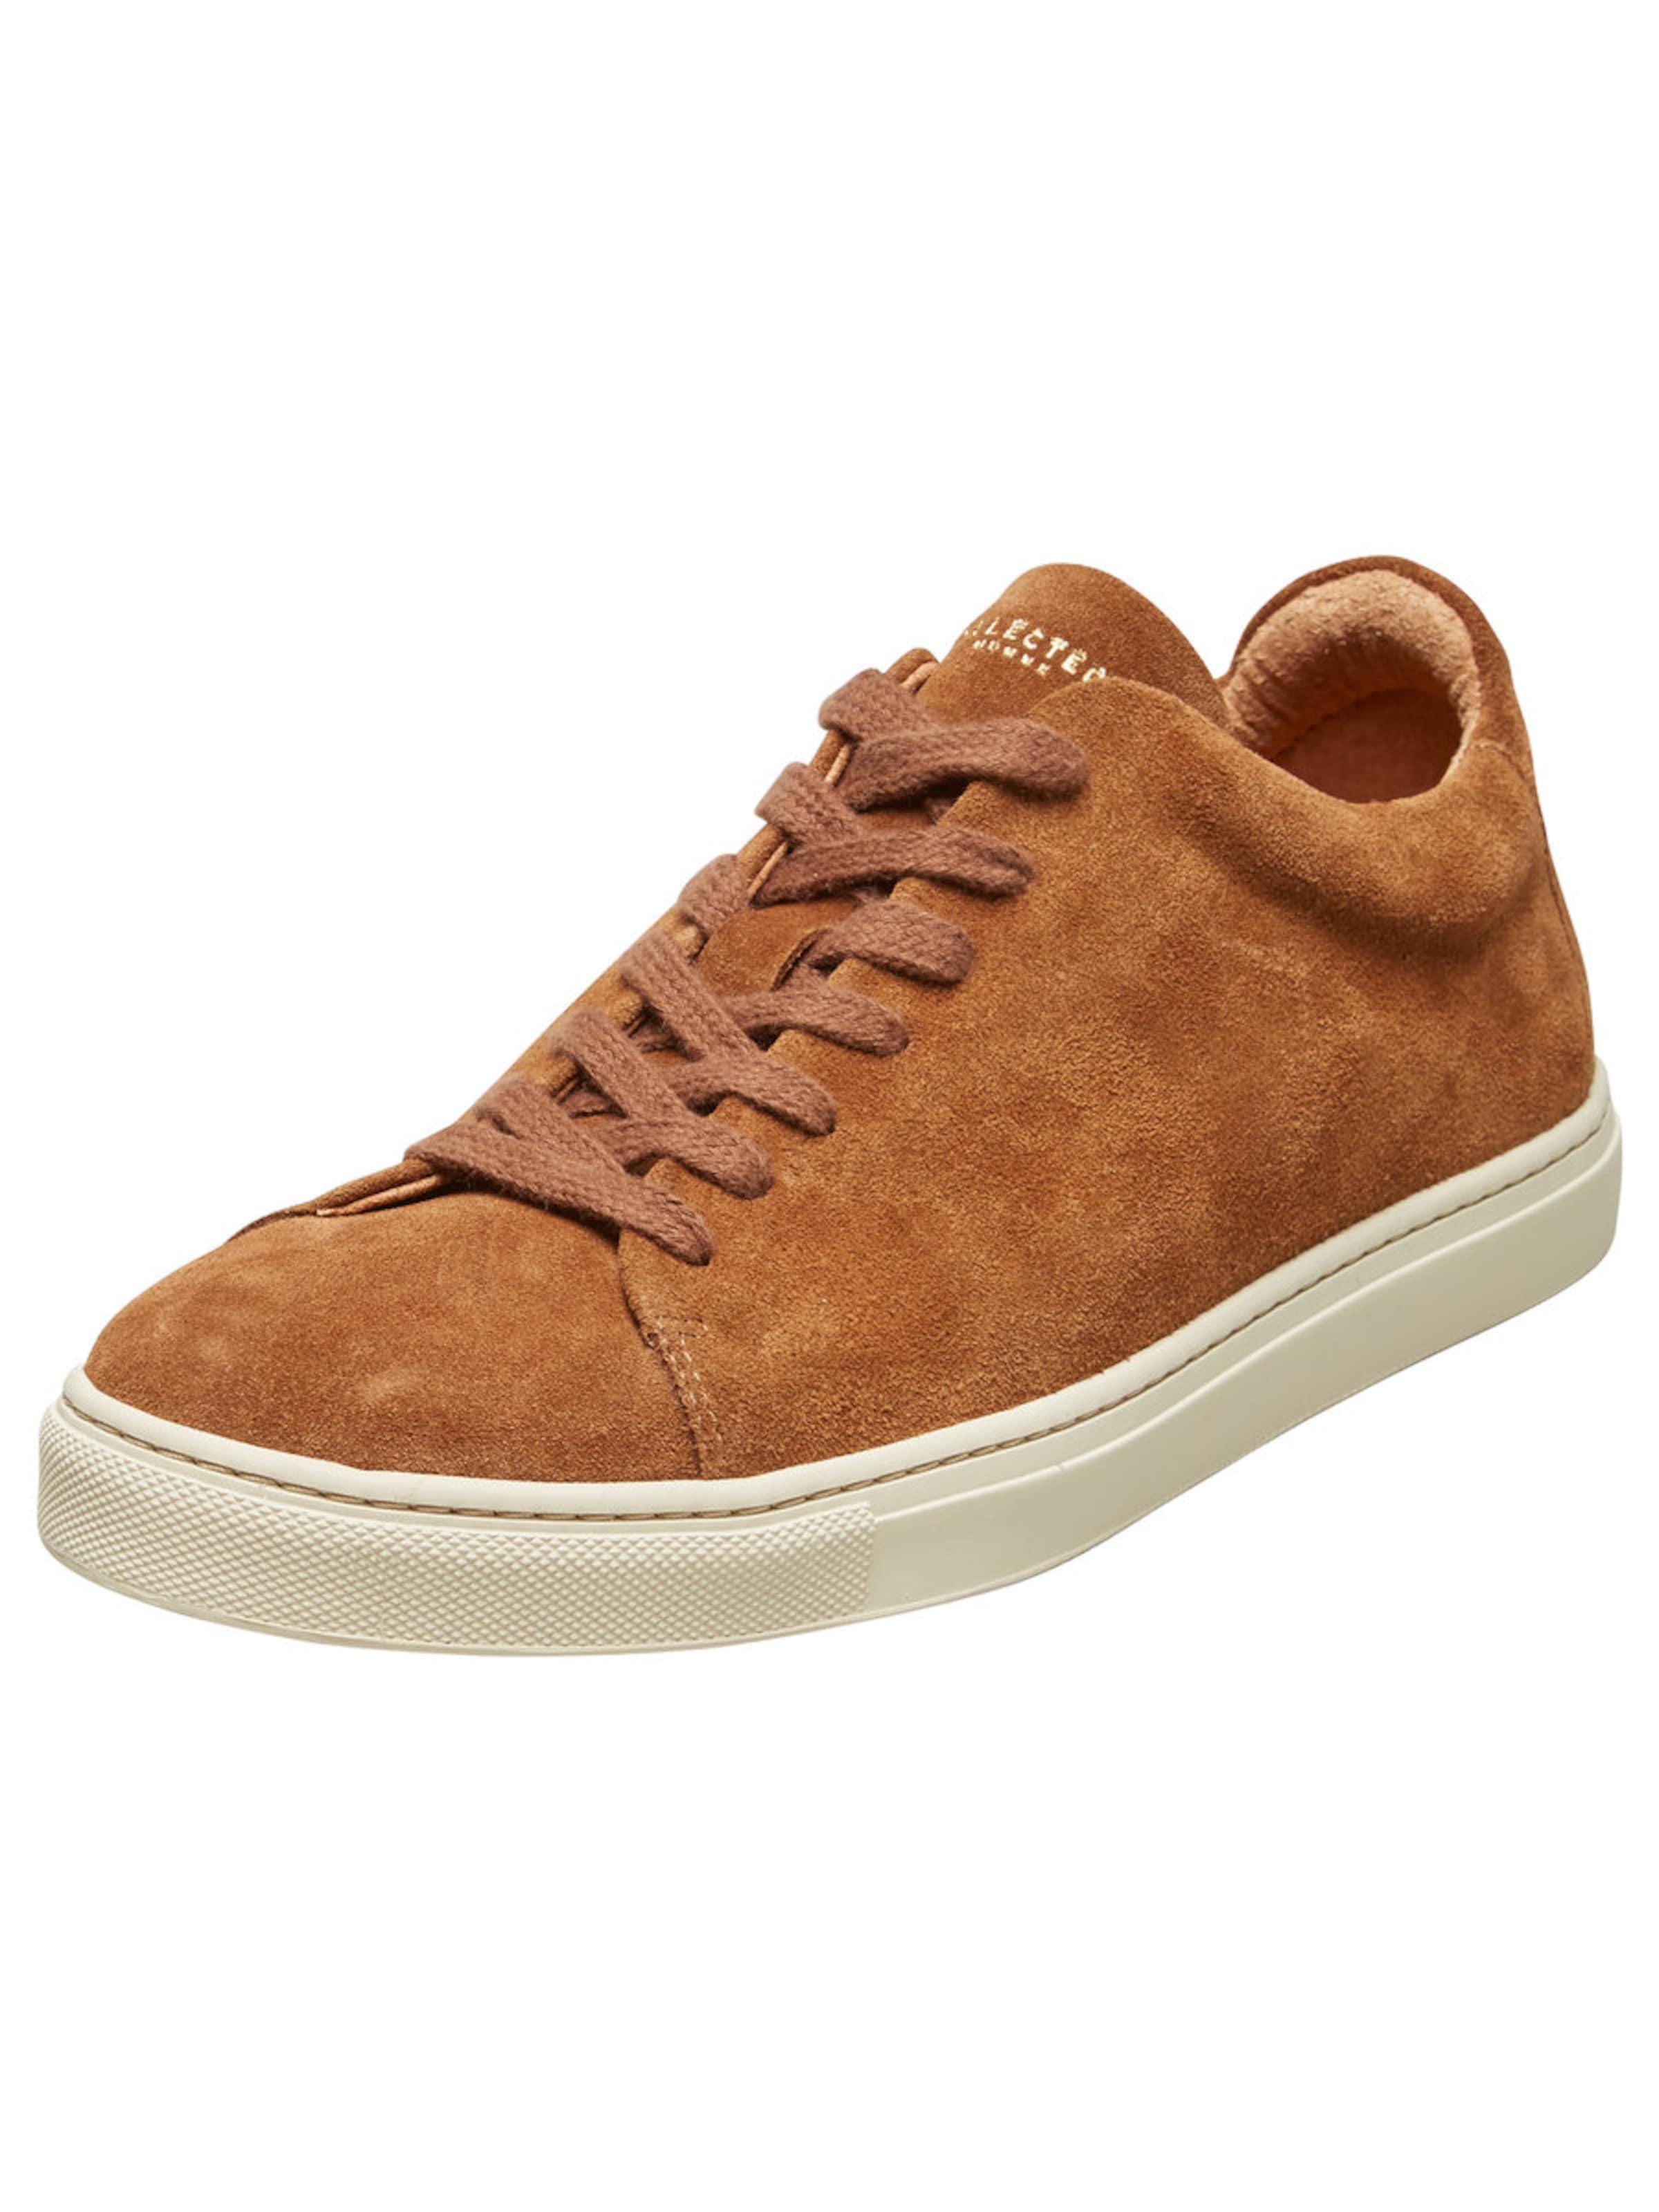 SELECTED HOMME Wildleder Sneaker Günstige und langlebige Schuhe